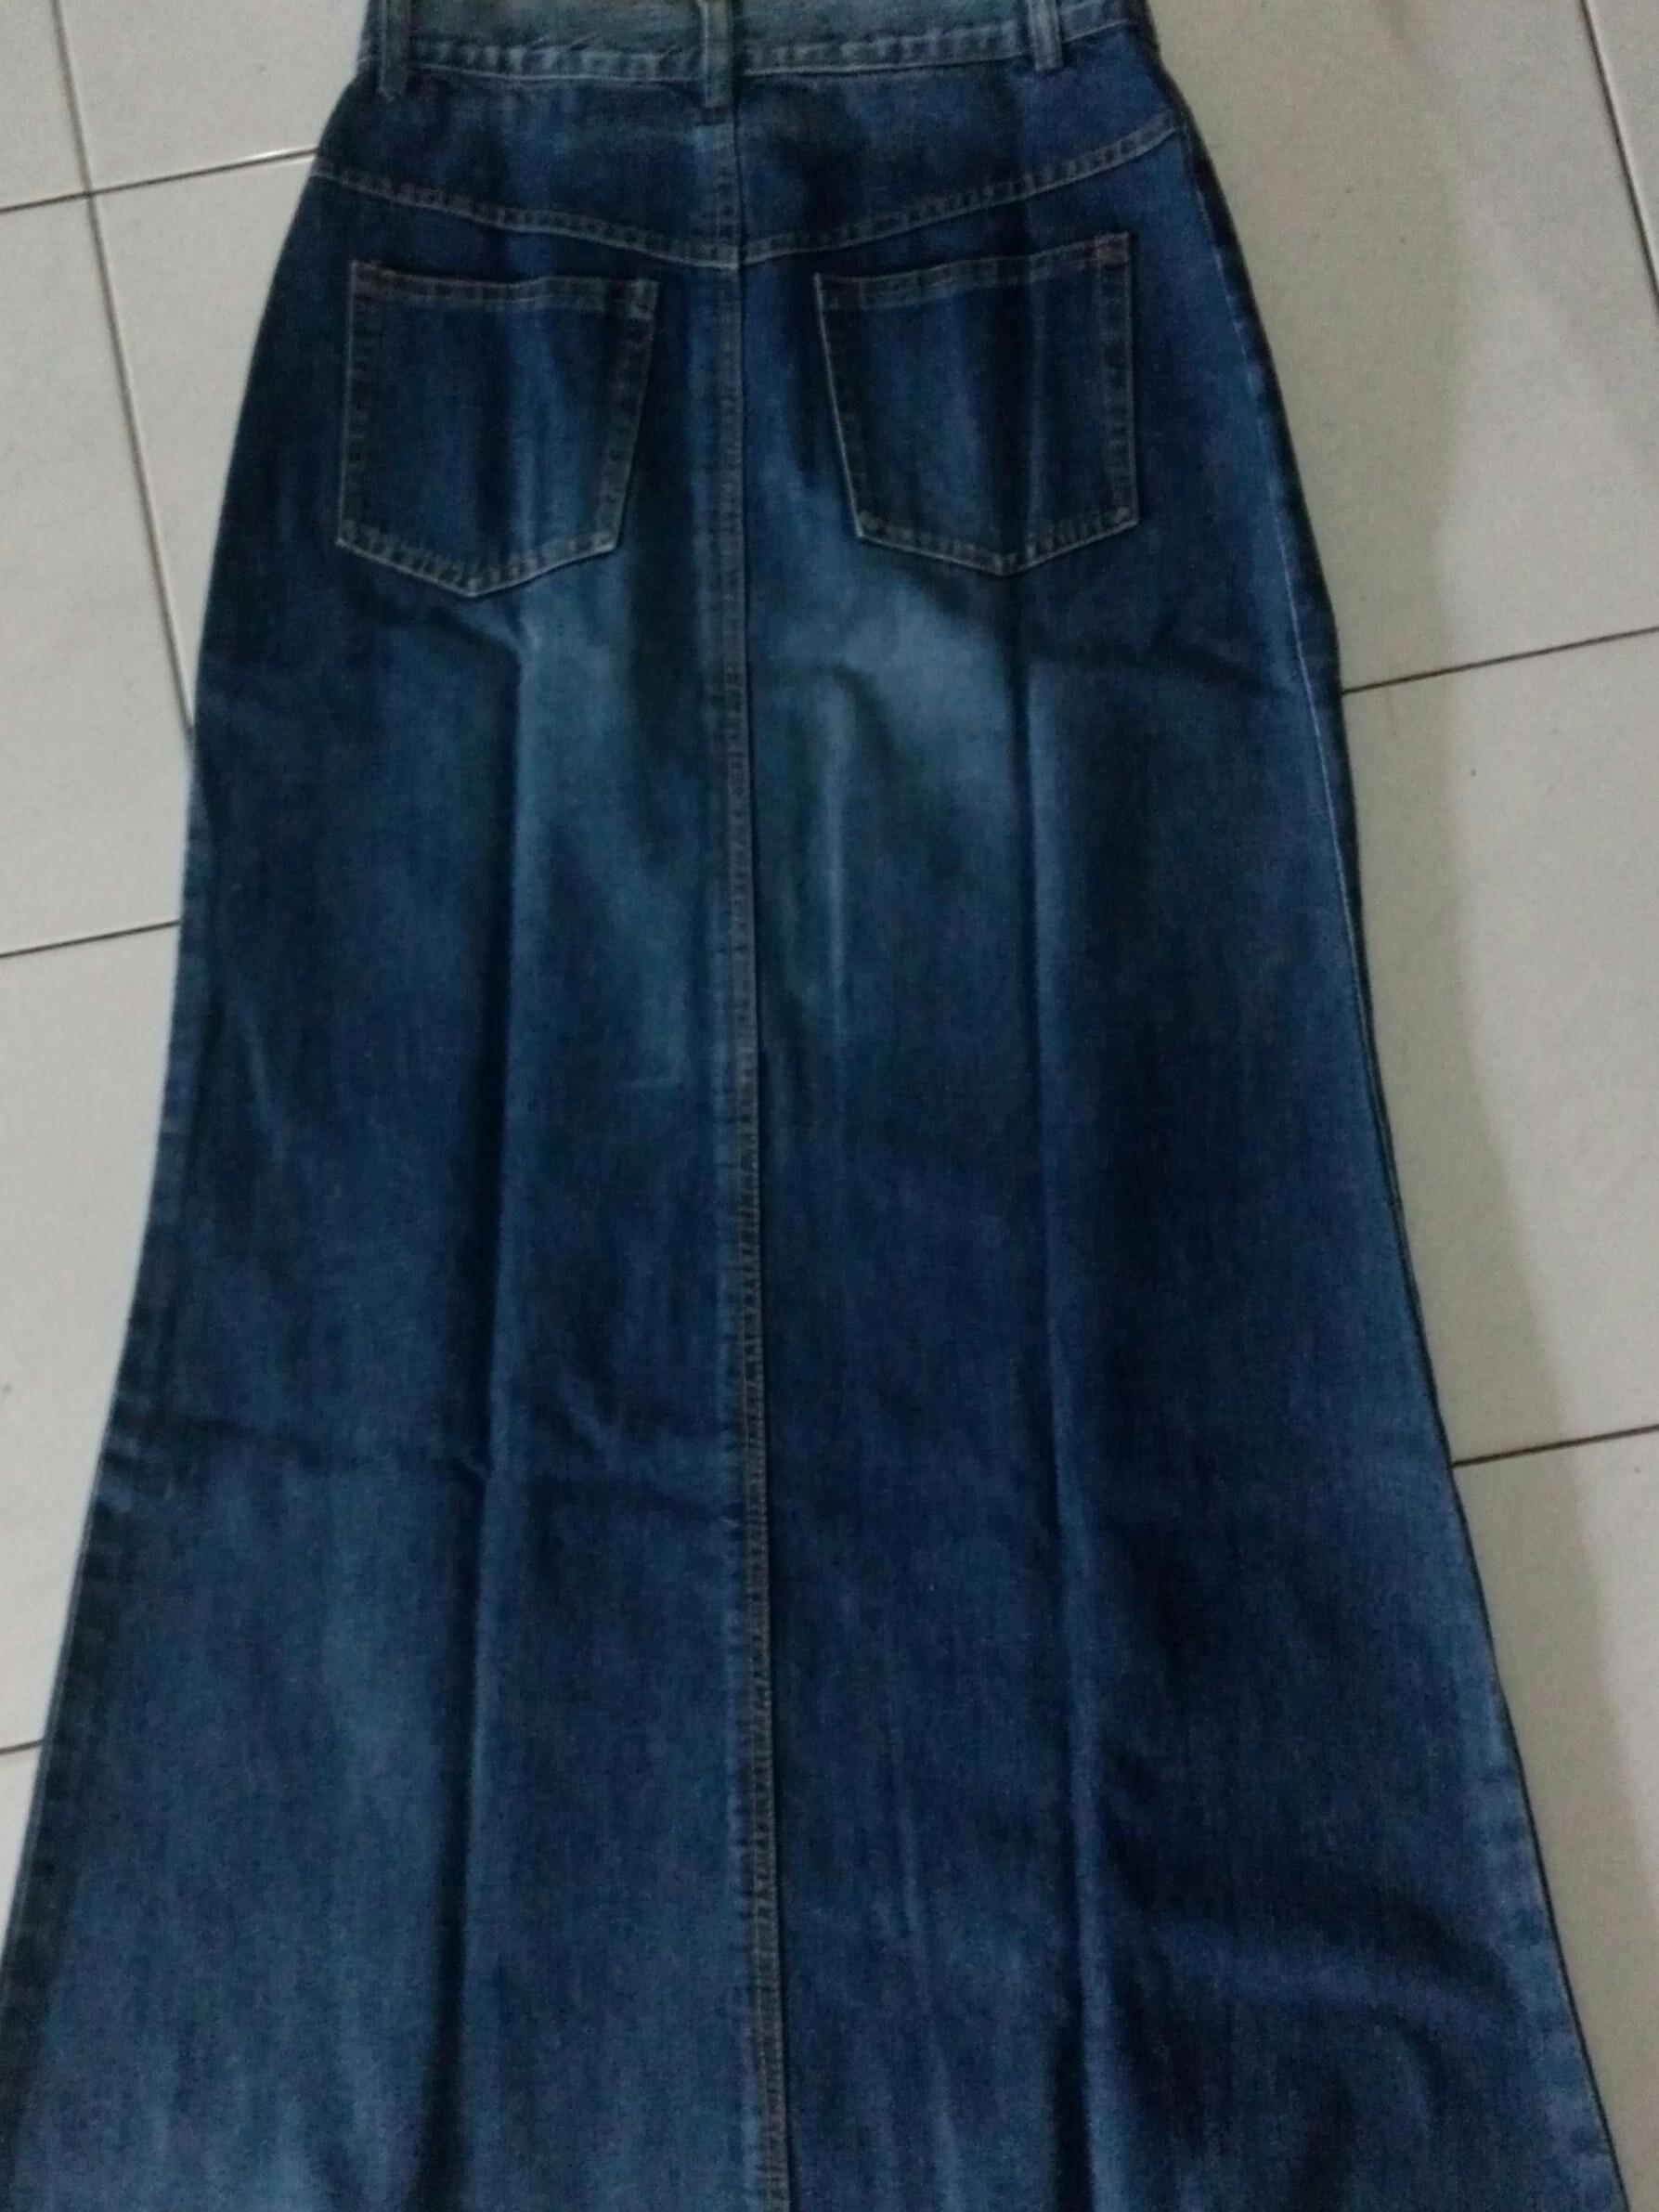 My Jeans Skirt